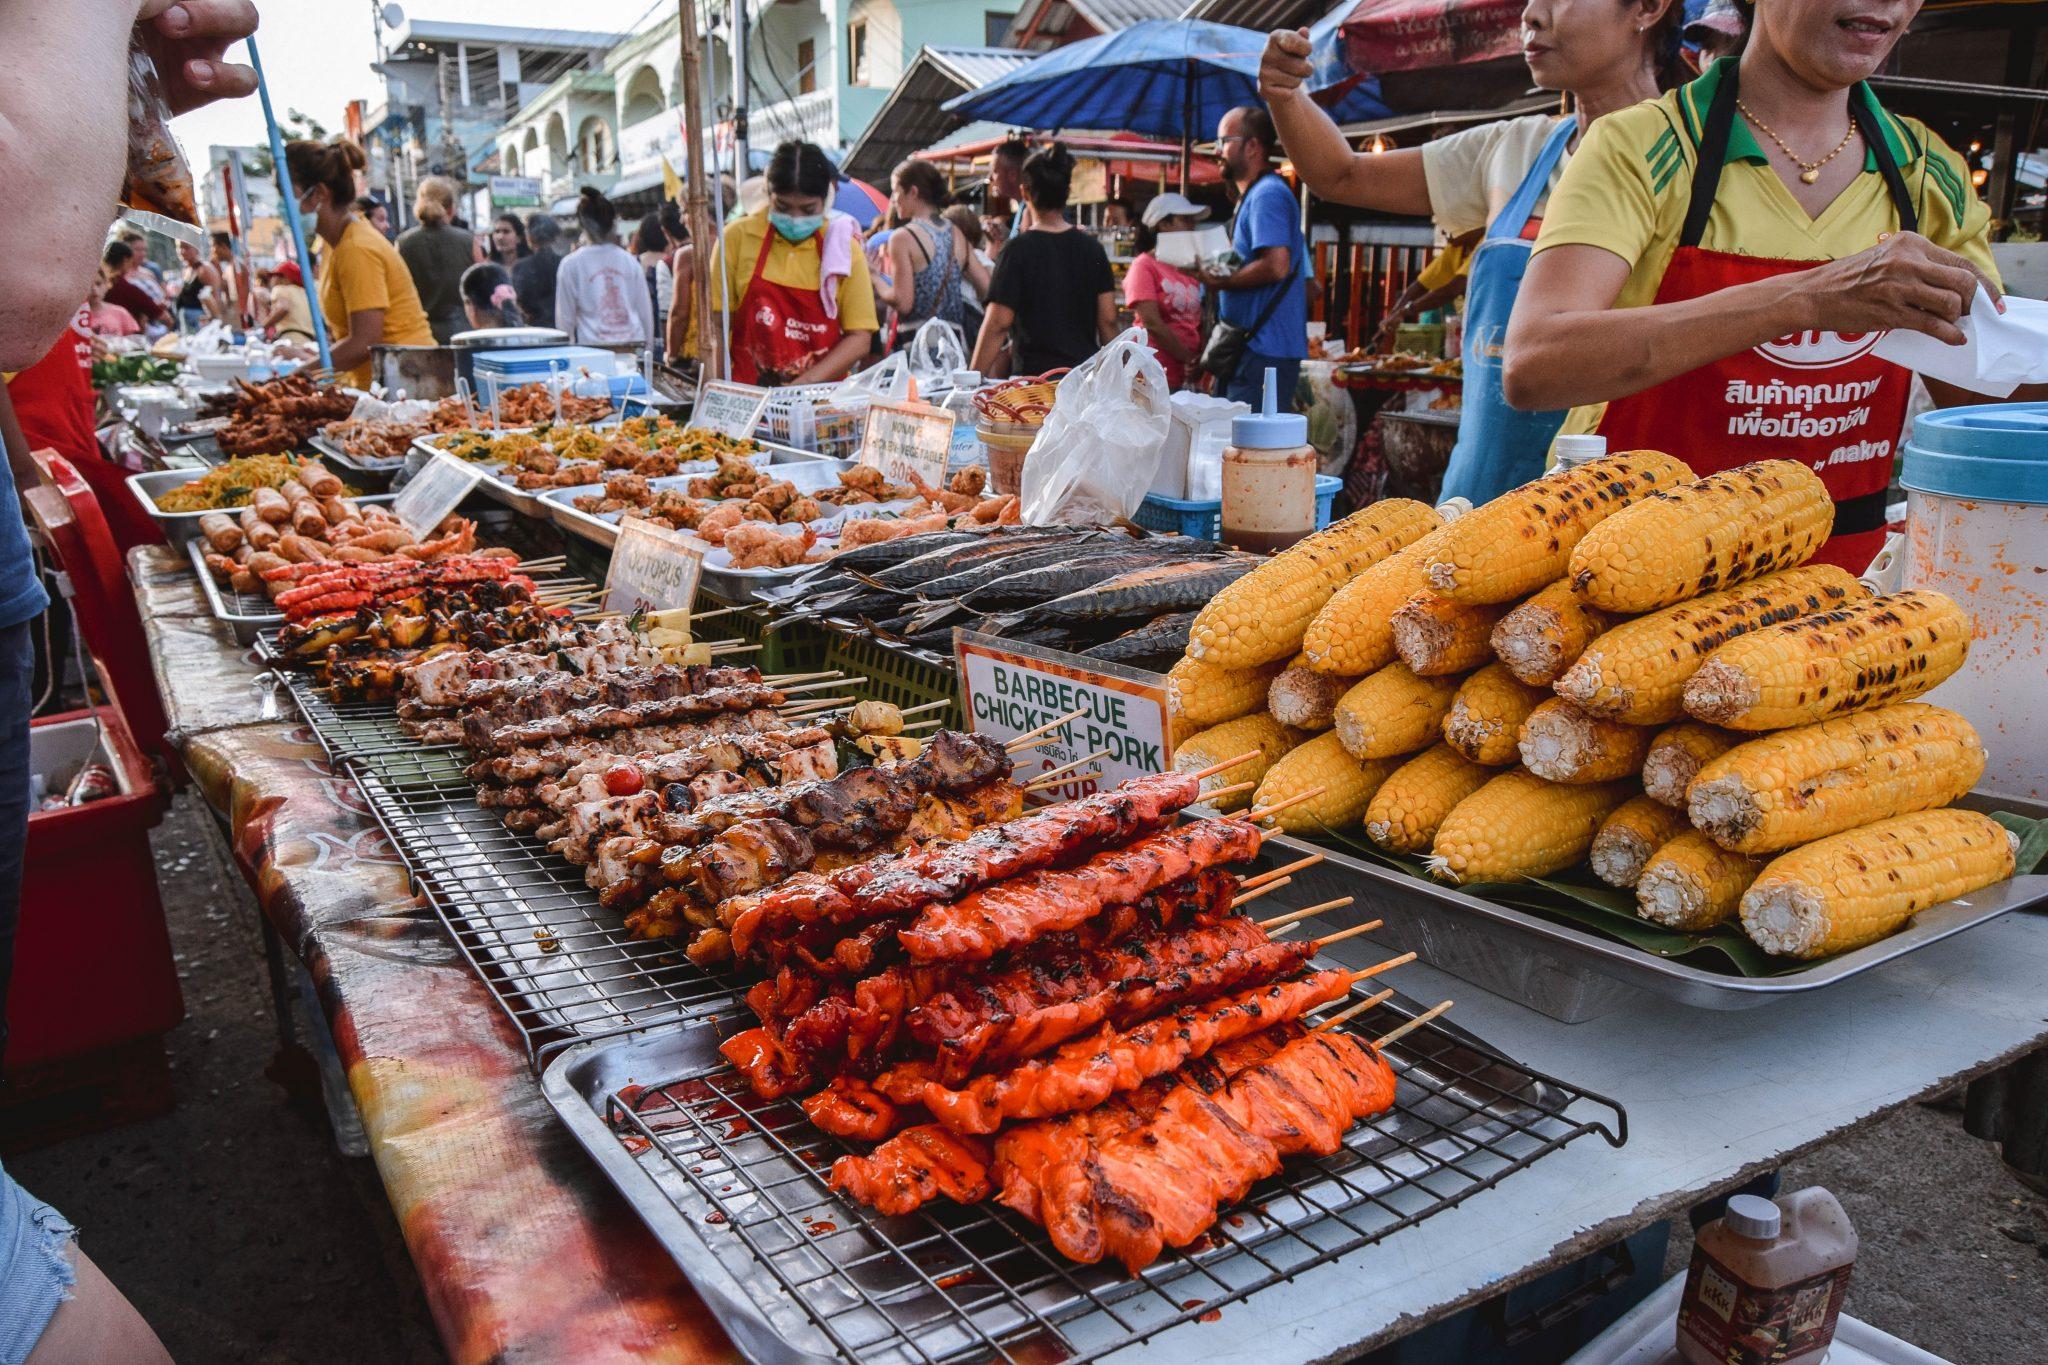 Wanderers & Warriors - Thong Sala Night Market Koh Phangan Night Market - Pantip Market Thong Sala Market